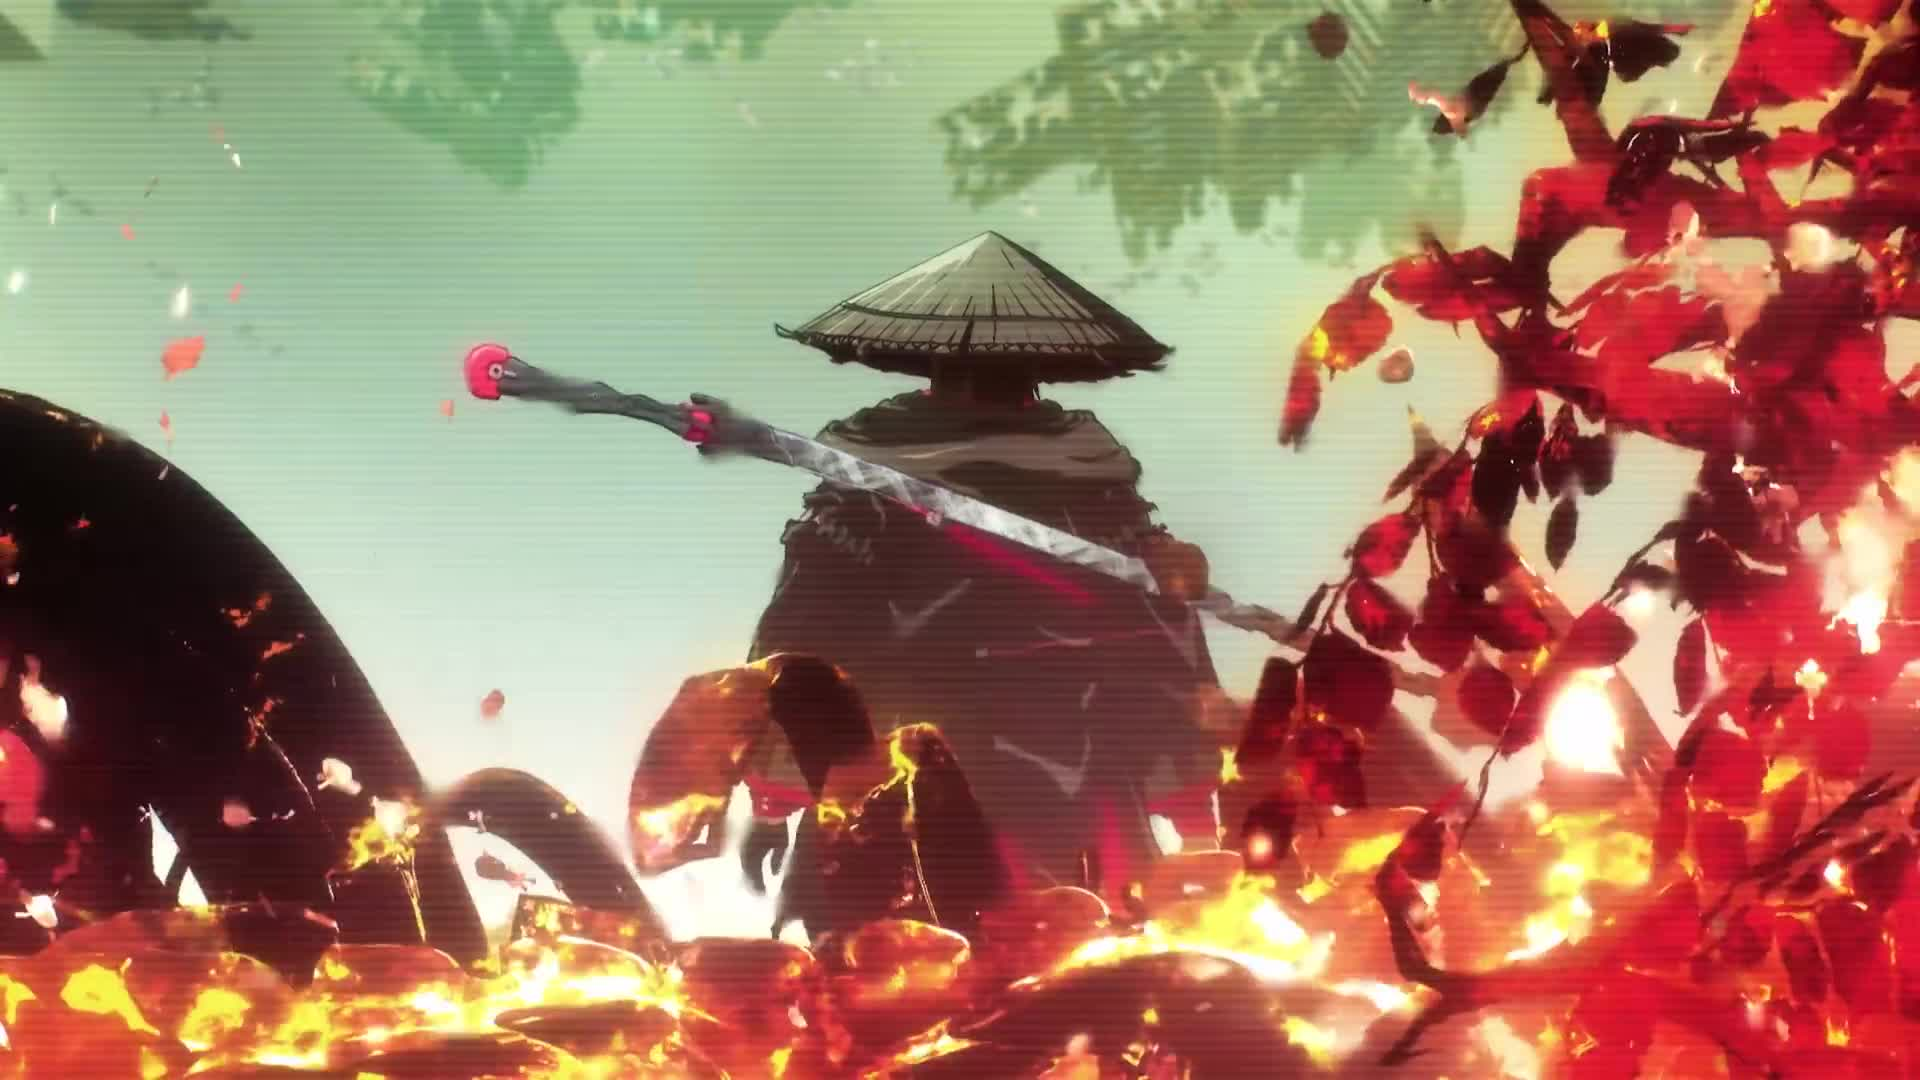 Trailer, actionspiel, Rollenspiel, Bandai Namco, Scarlet Nexus